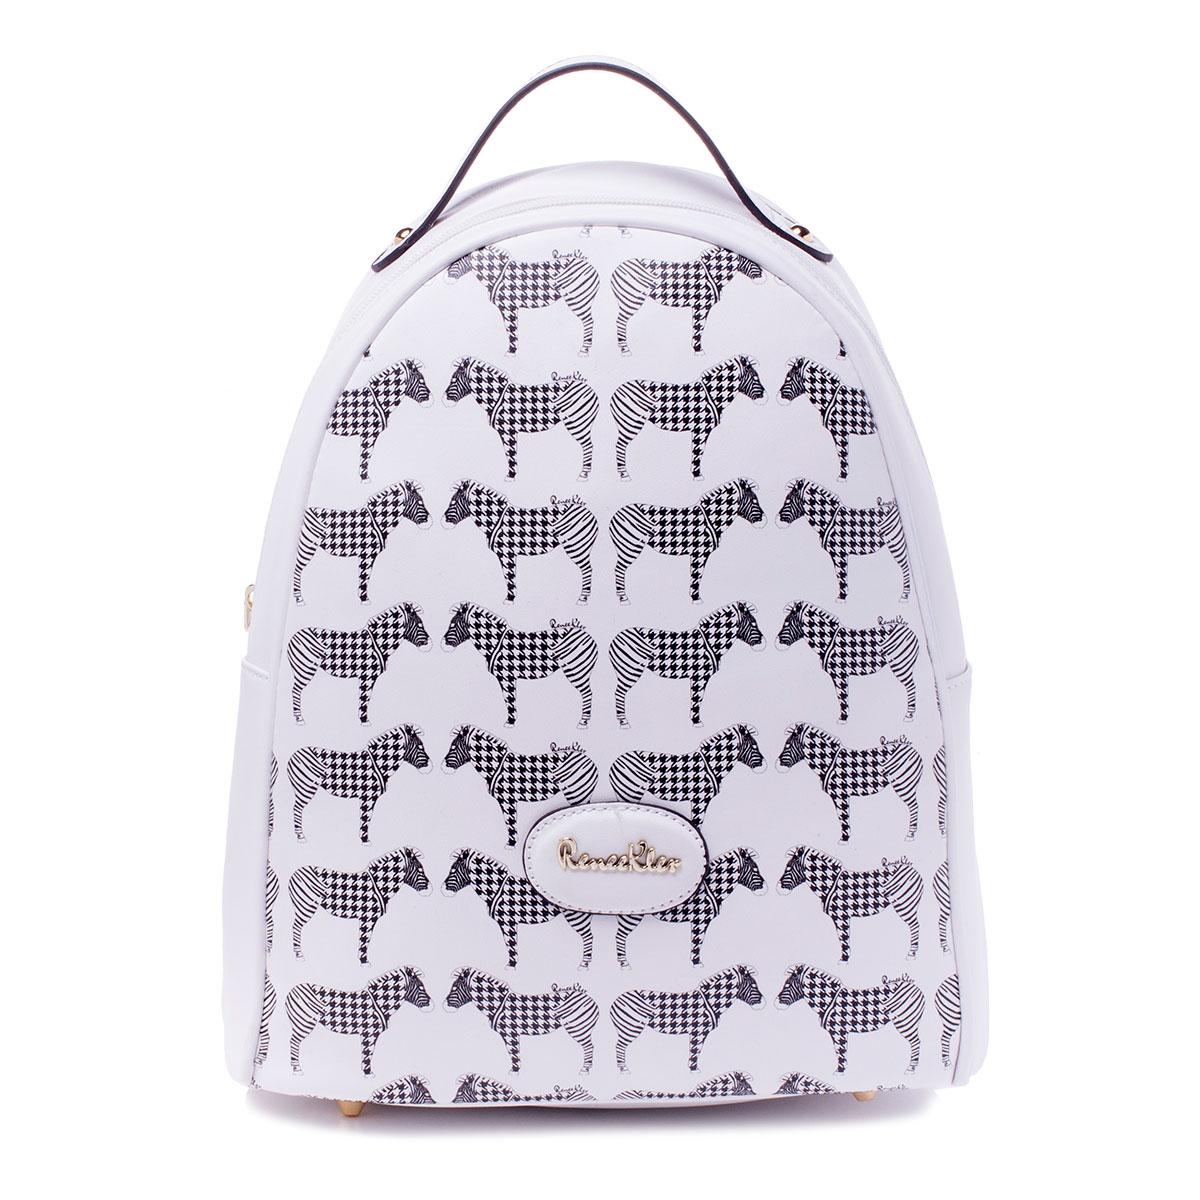 Сумка-рюкзак женская Renee Kler, цвет: белый. RK487-02RK487-02Рюкзак жен., иск. кожа